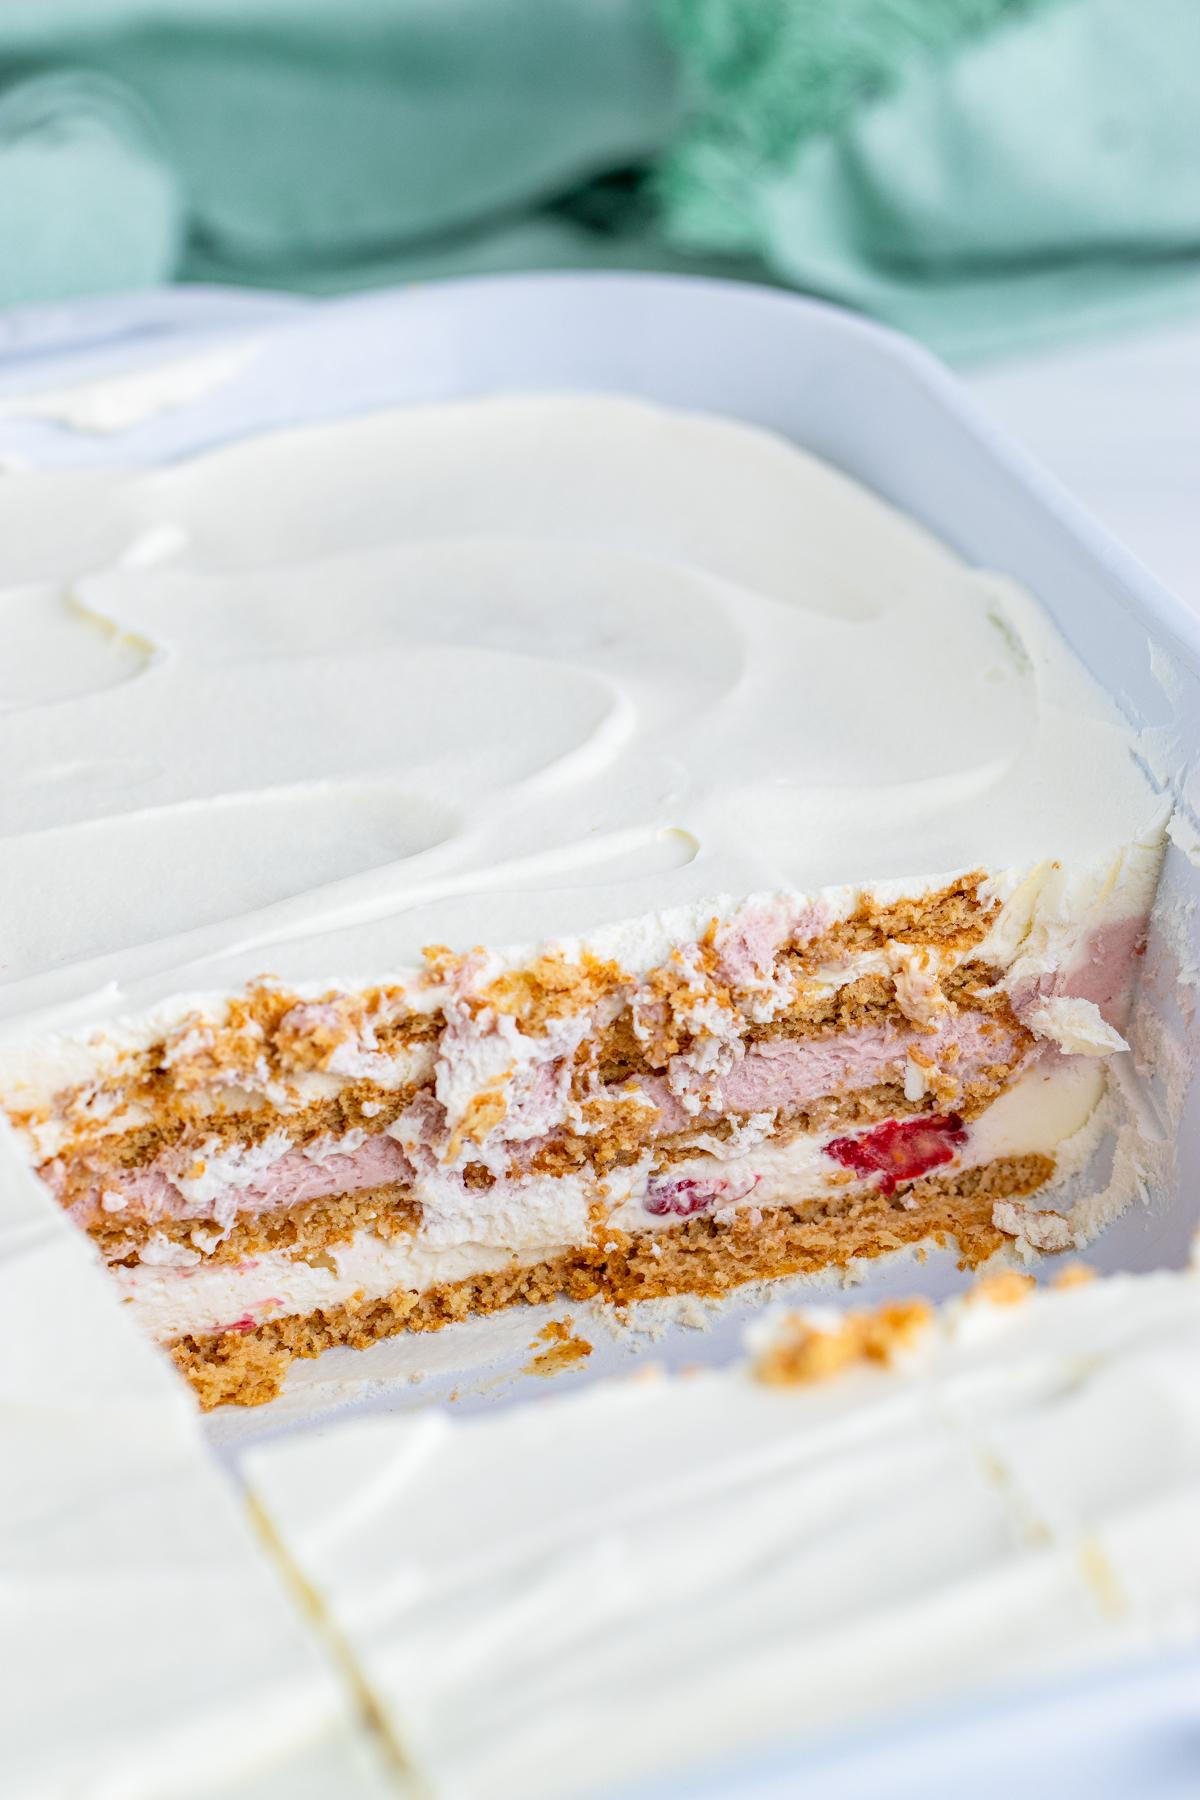 Inside pan of Icebox Cake Recipe showing layers